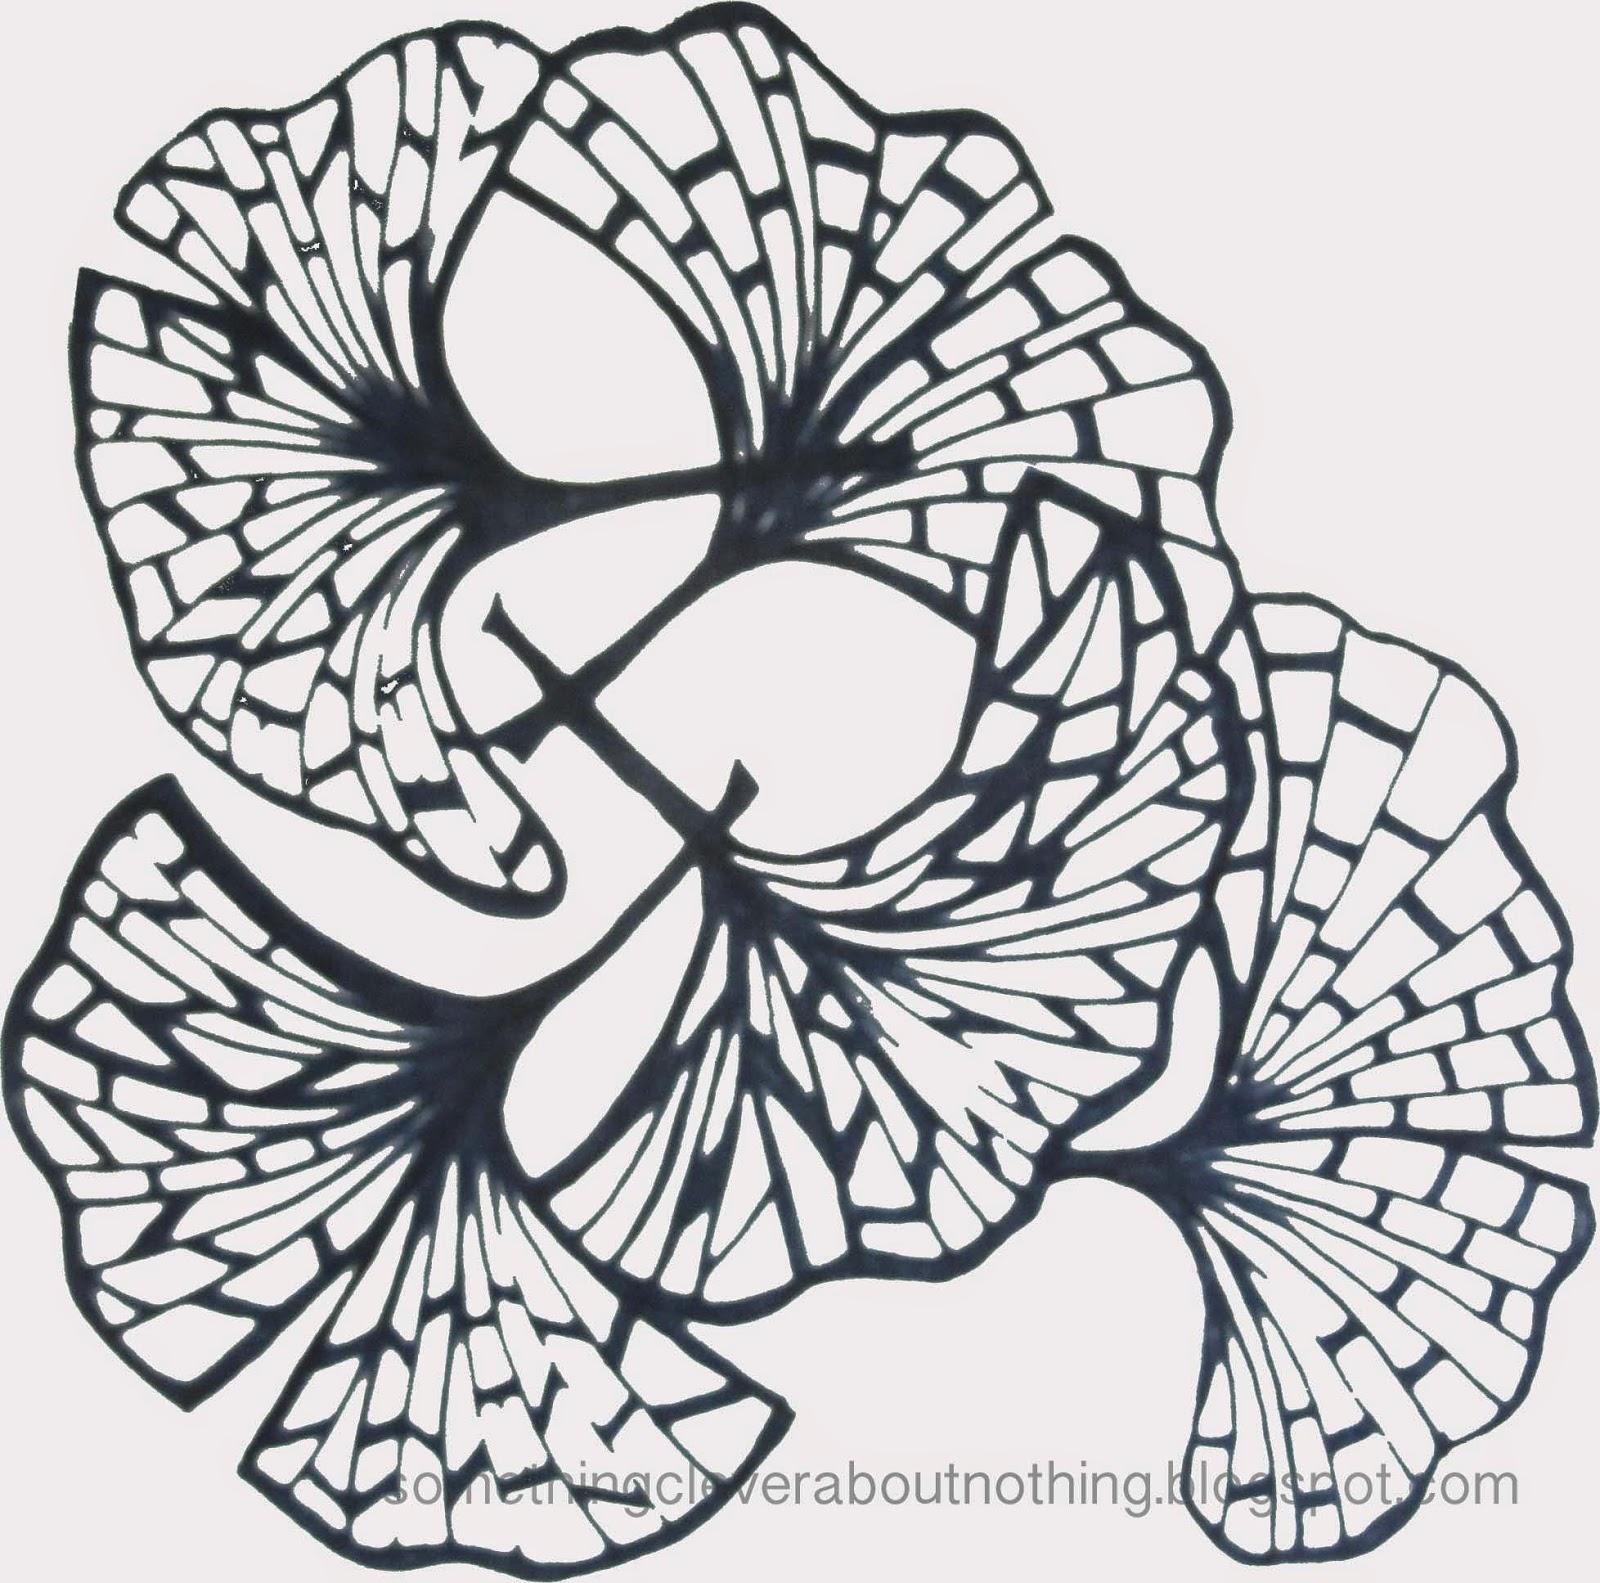 http://3.bp.blogspot.com/-7dcupto45yk/U9ruyt35YaI/AAAAAAAAOnk/D1i-oIw8OuA/s1600/my+drawings4.jpg